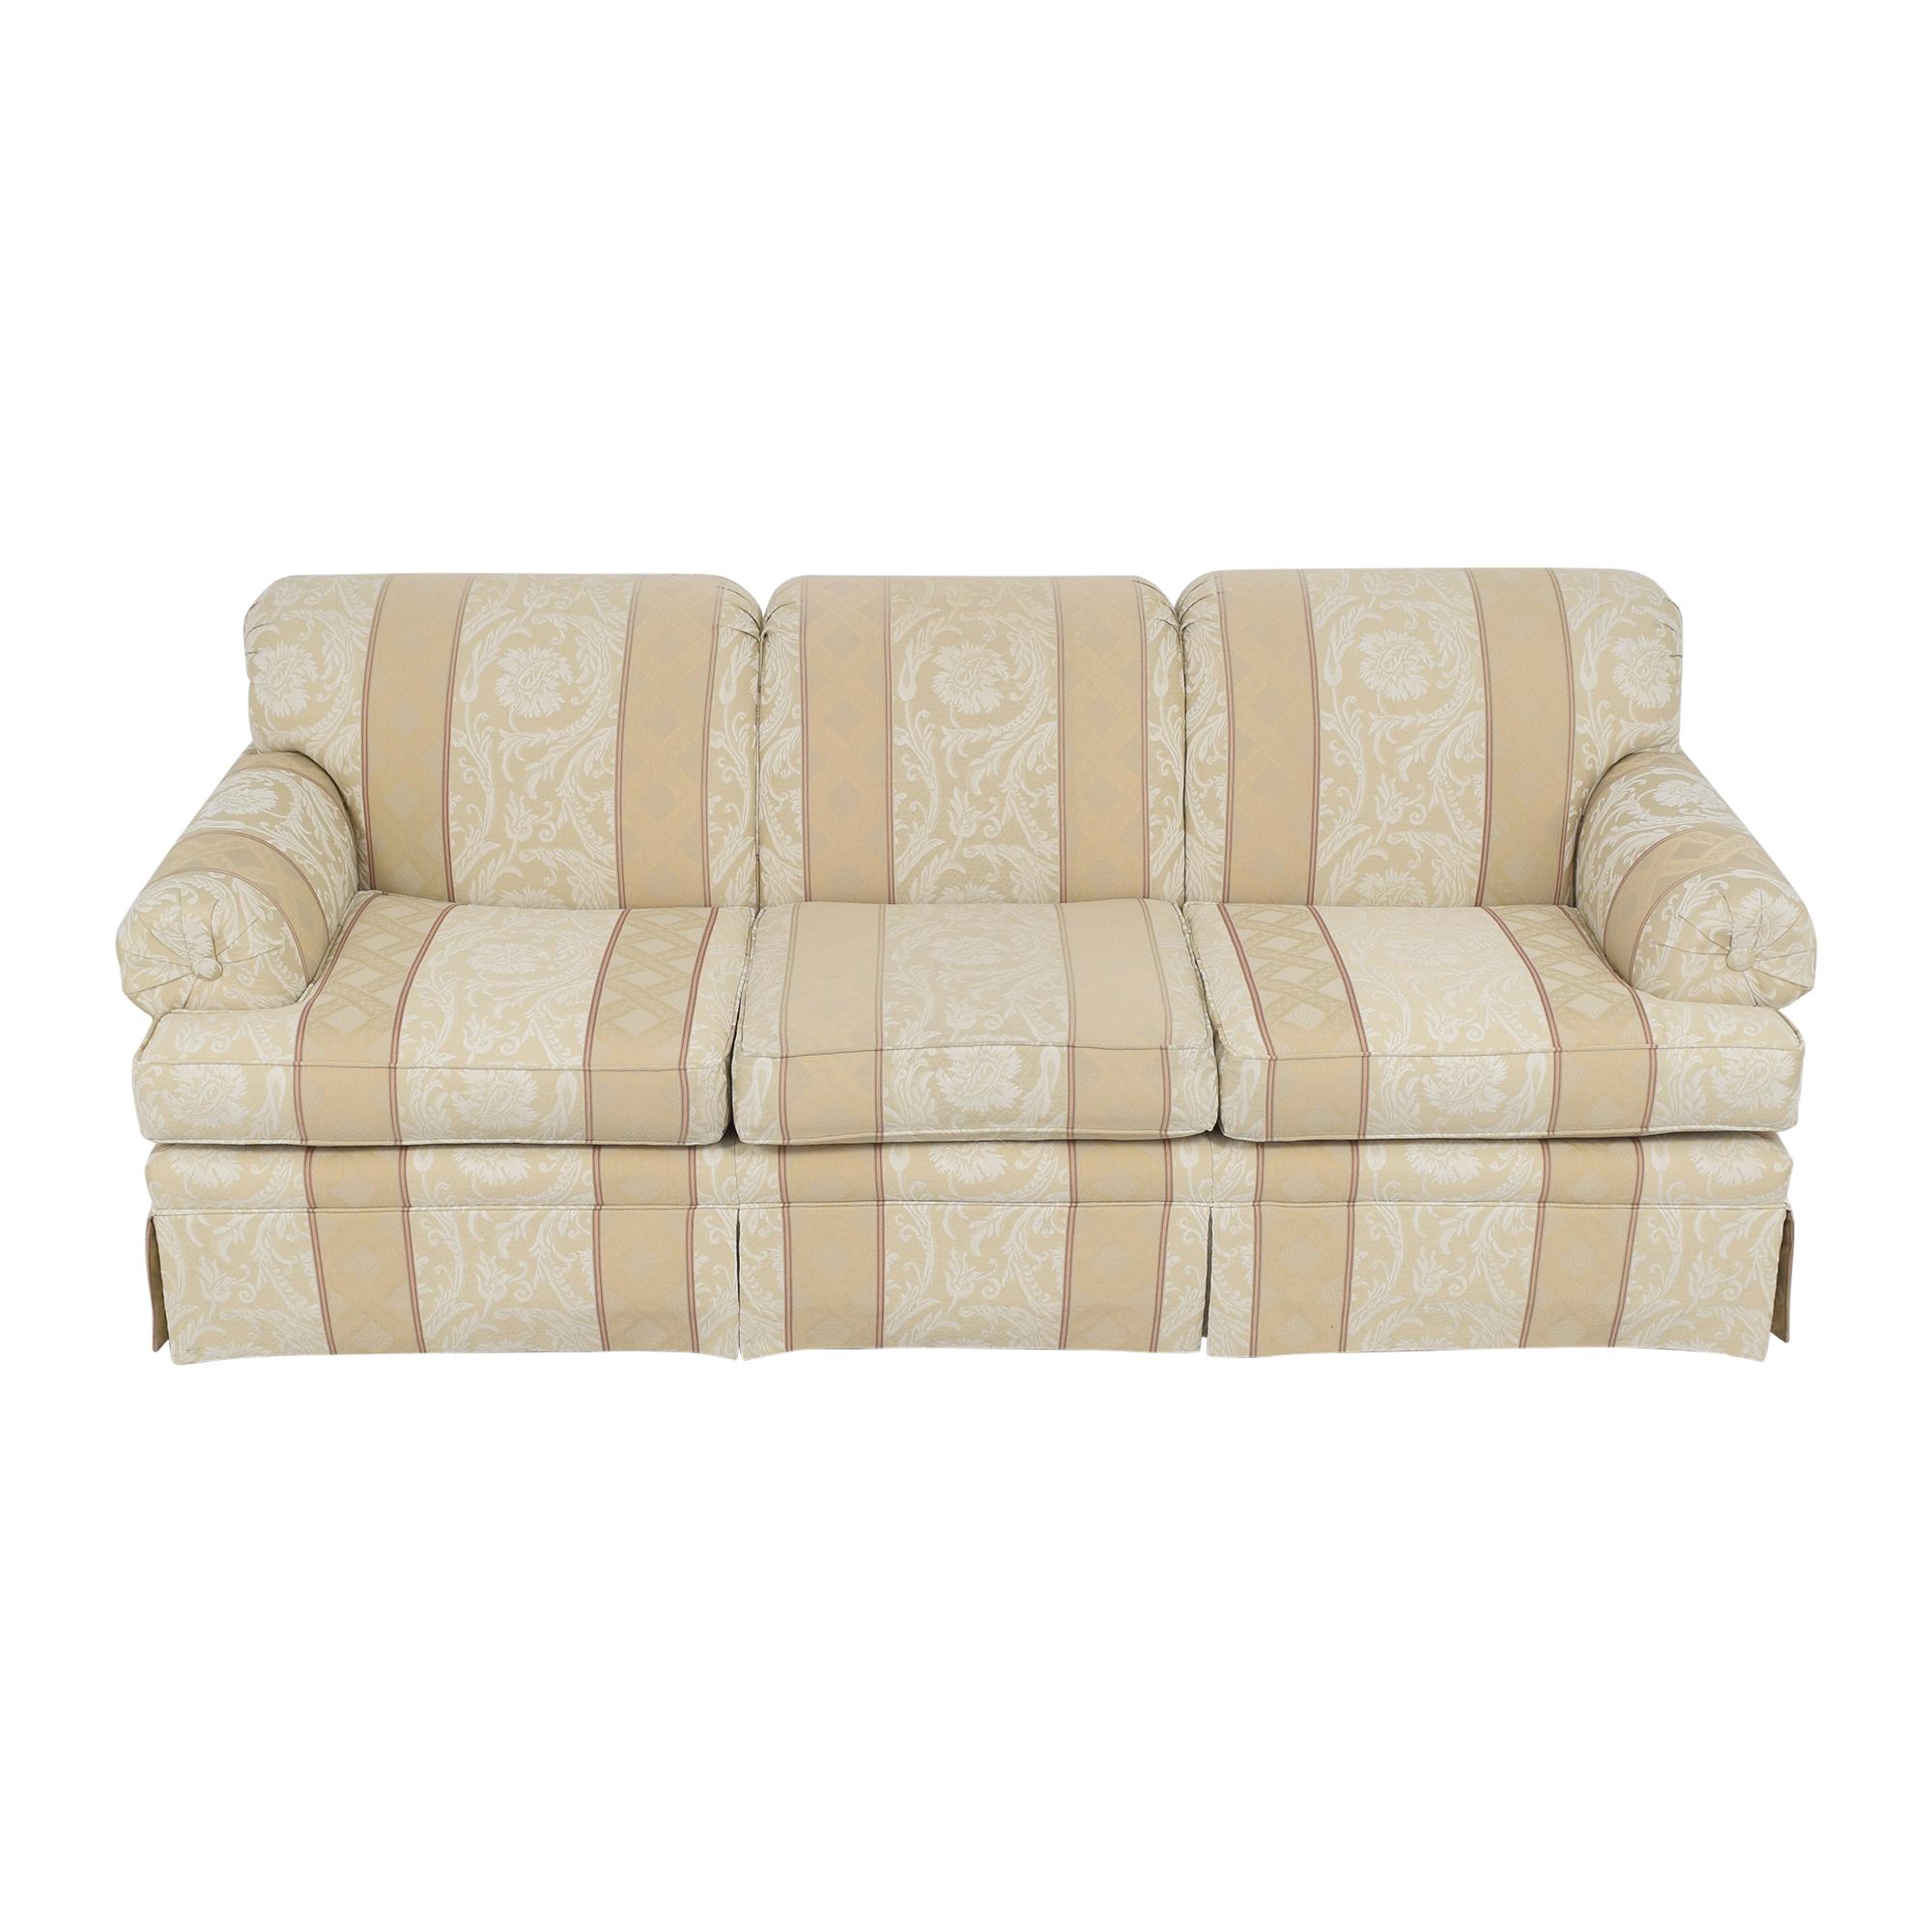 Ethan Allen Ethan Allen Roll Arm Sofa